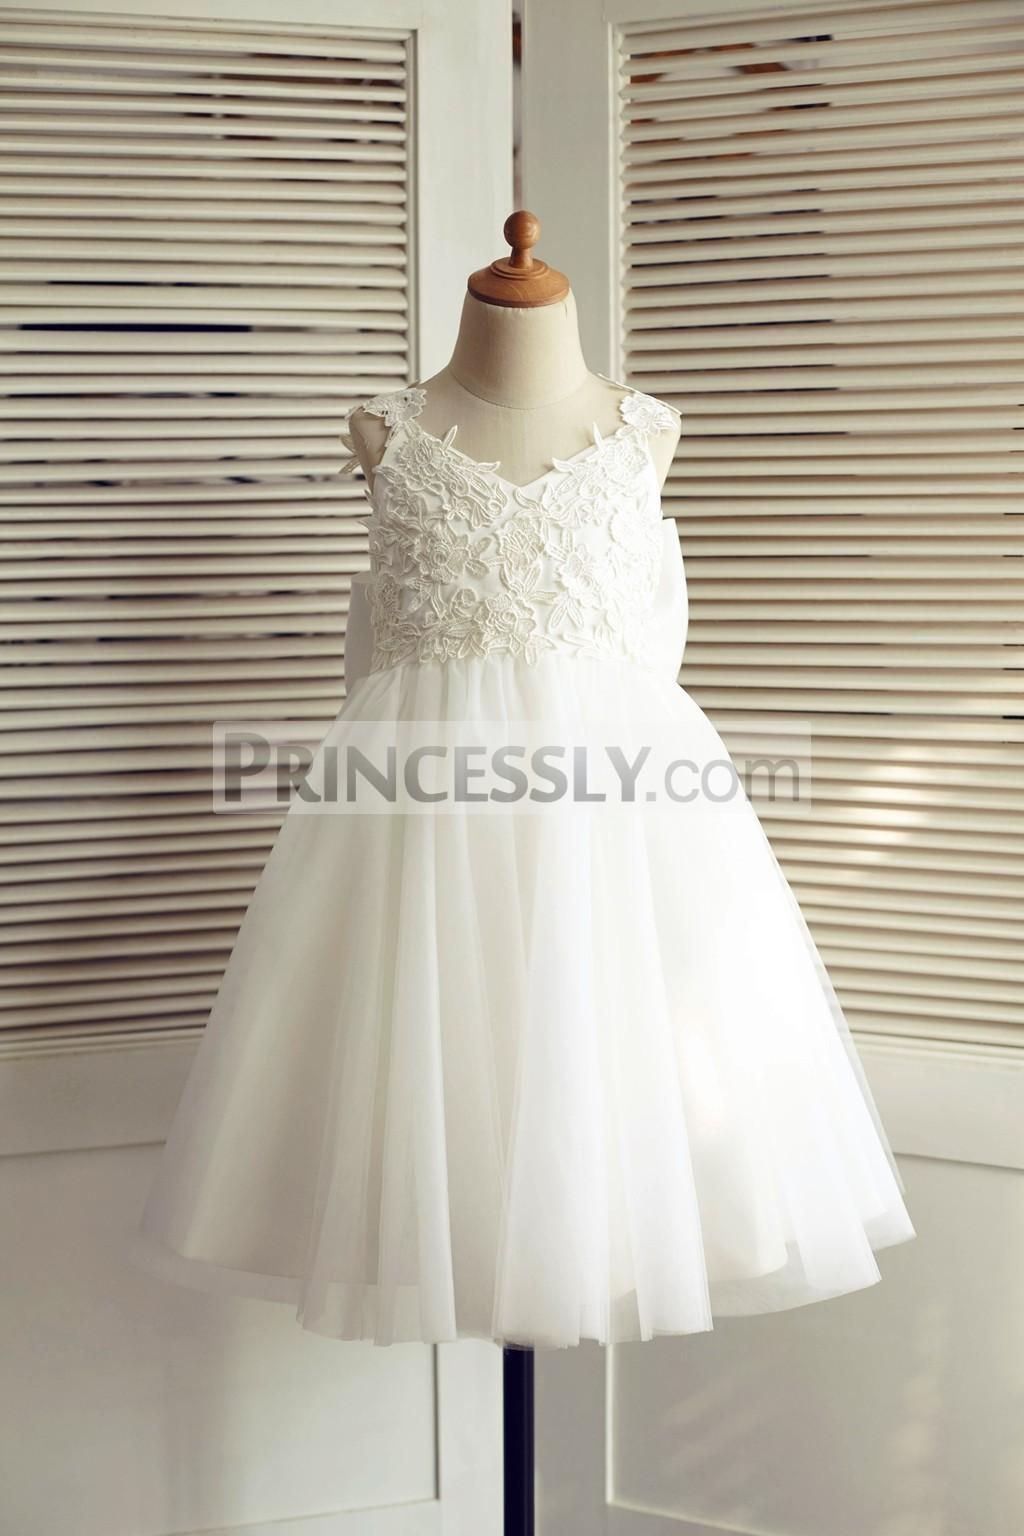 Ivory Lace V Neckline Princess Tulle Flower Girl Dress